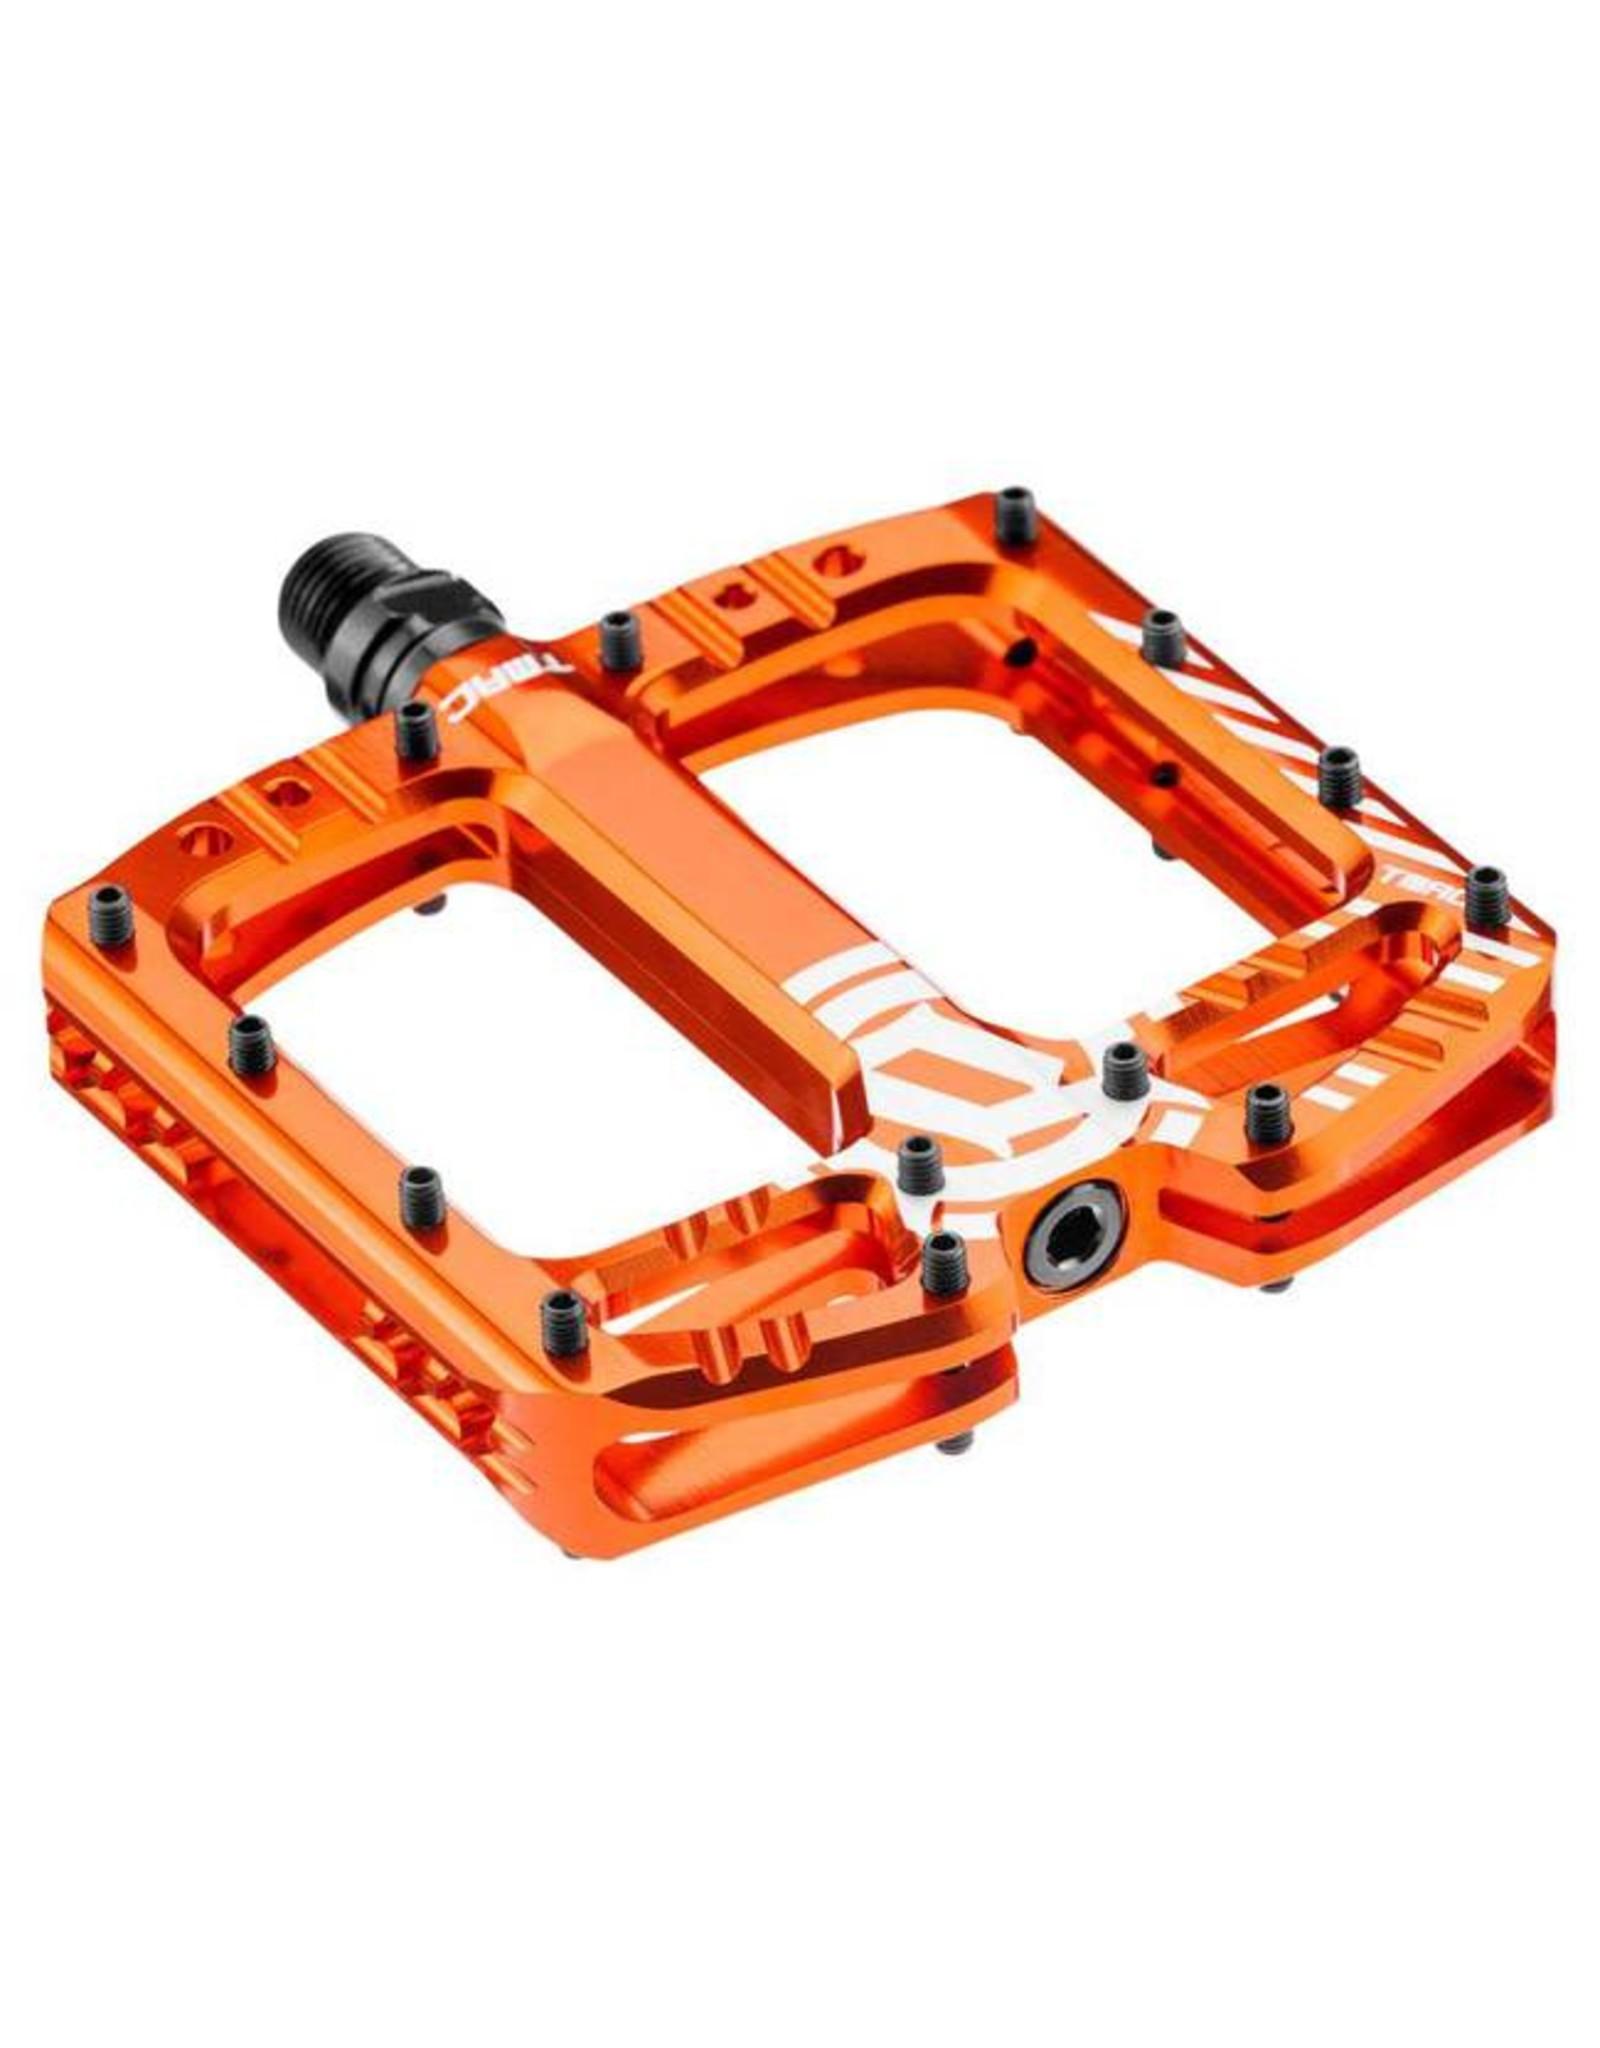 Deity Components Deity TMAC Pedals: Orange/Laser Graphics